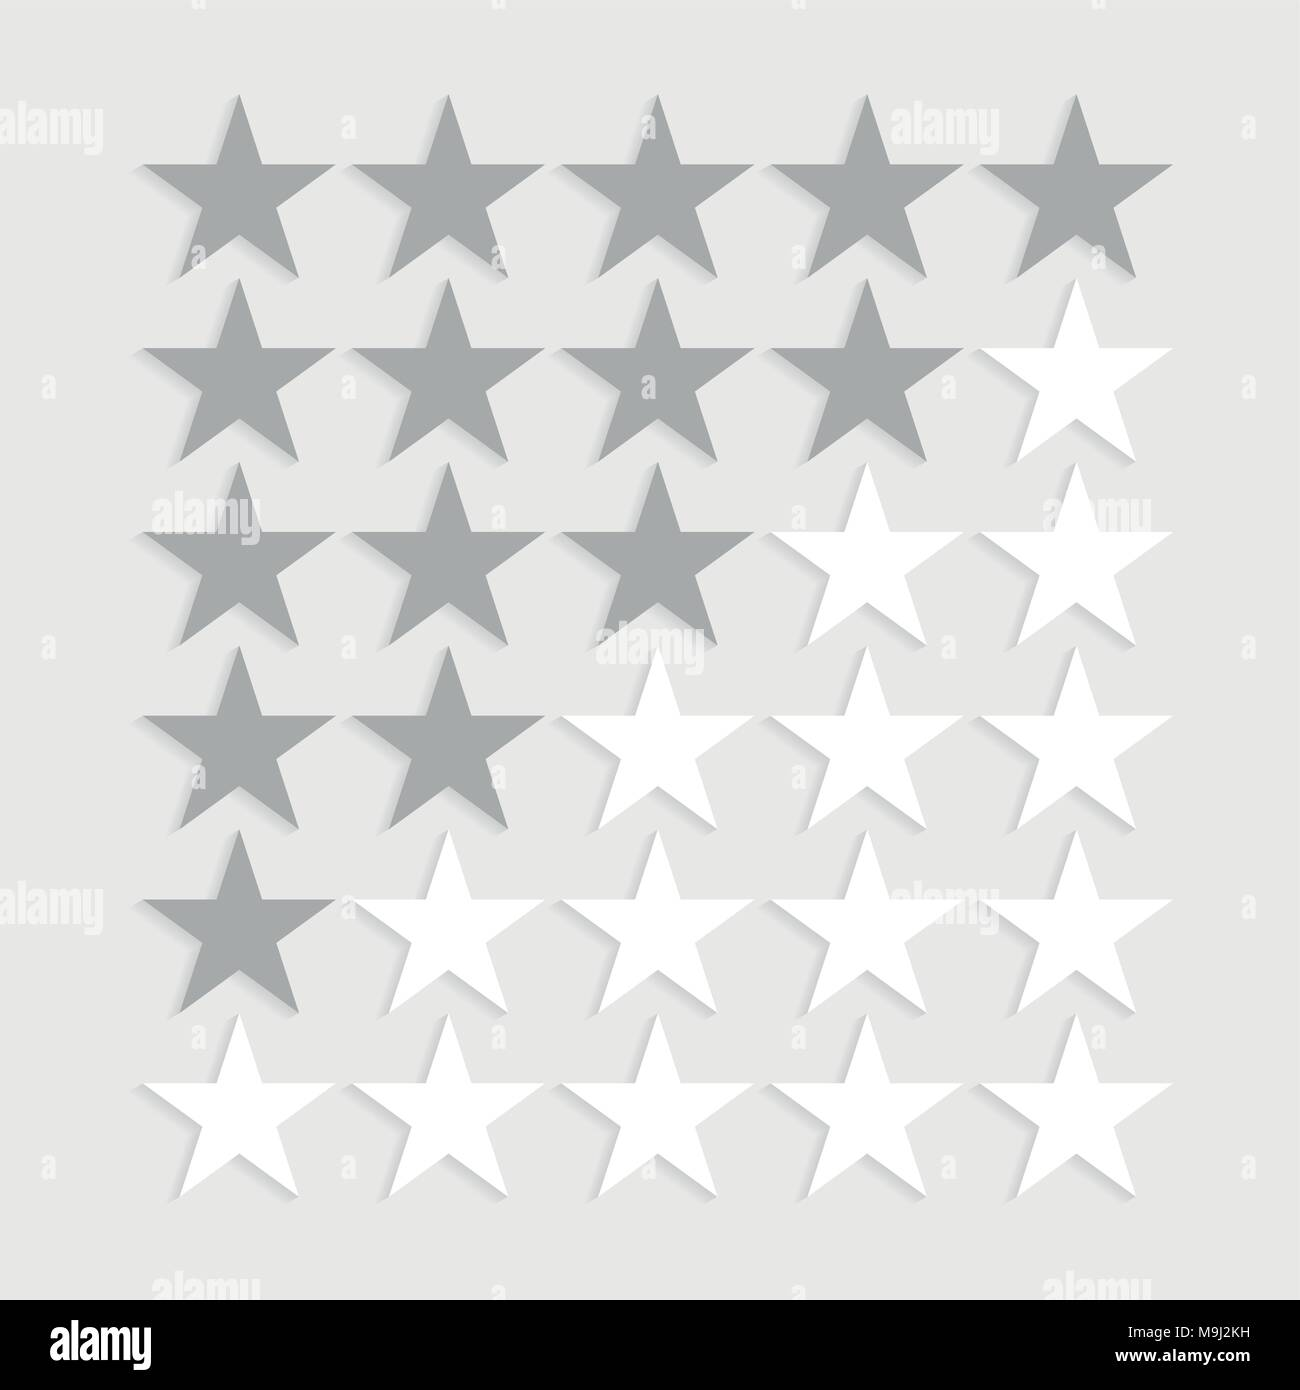 Star Rating Symbols Stock Vector Art Illustration Vector Image